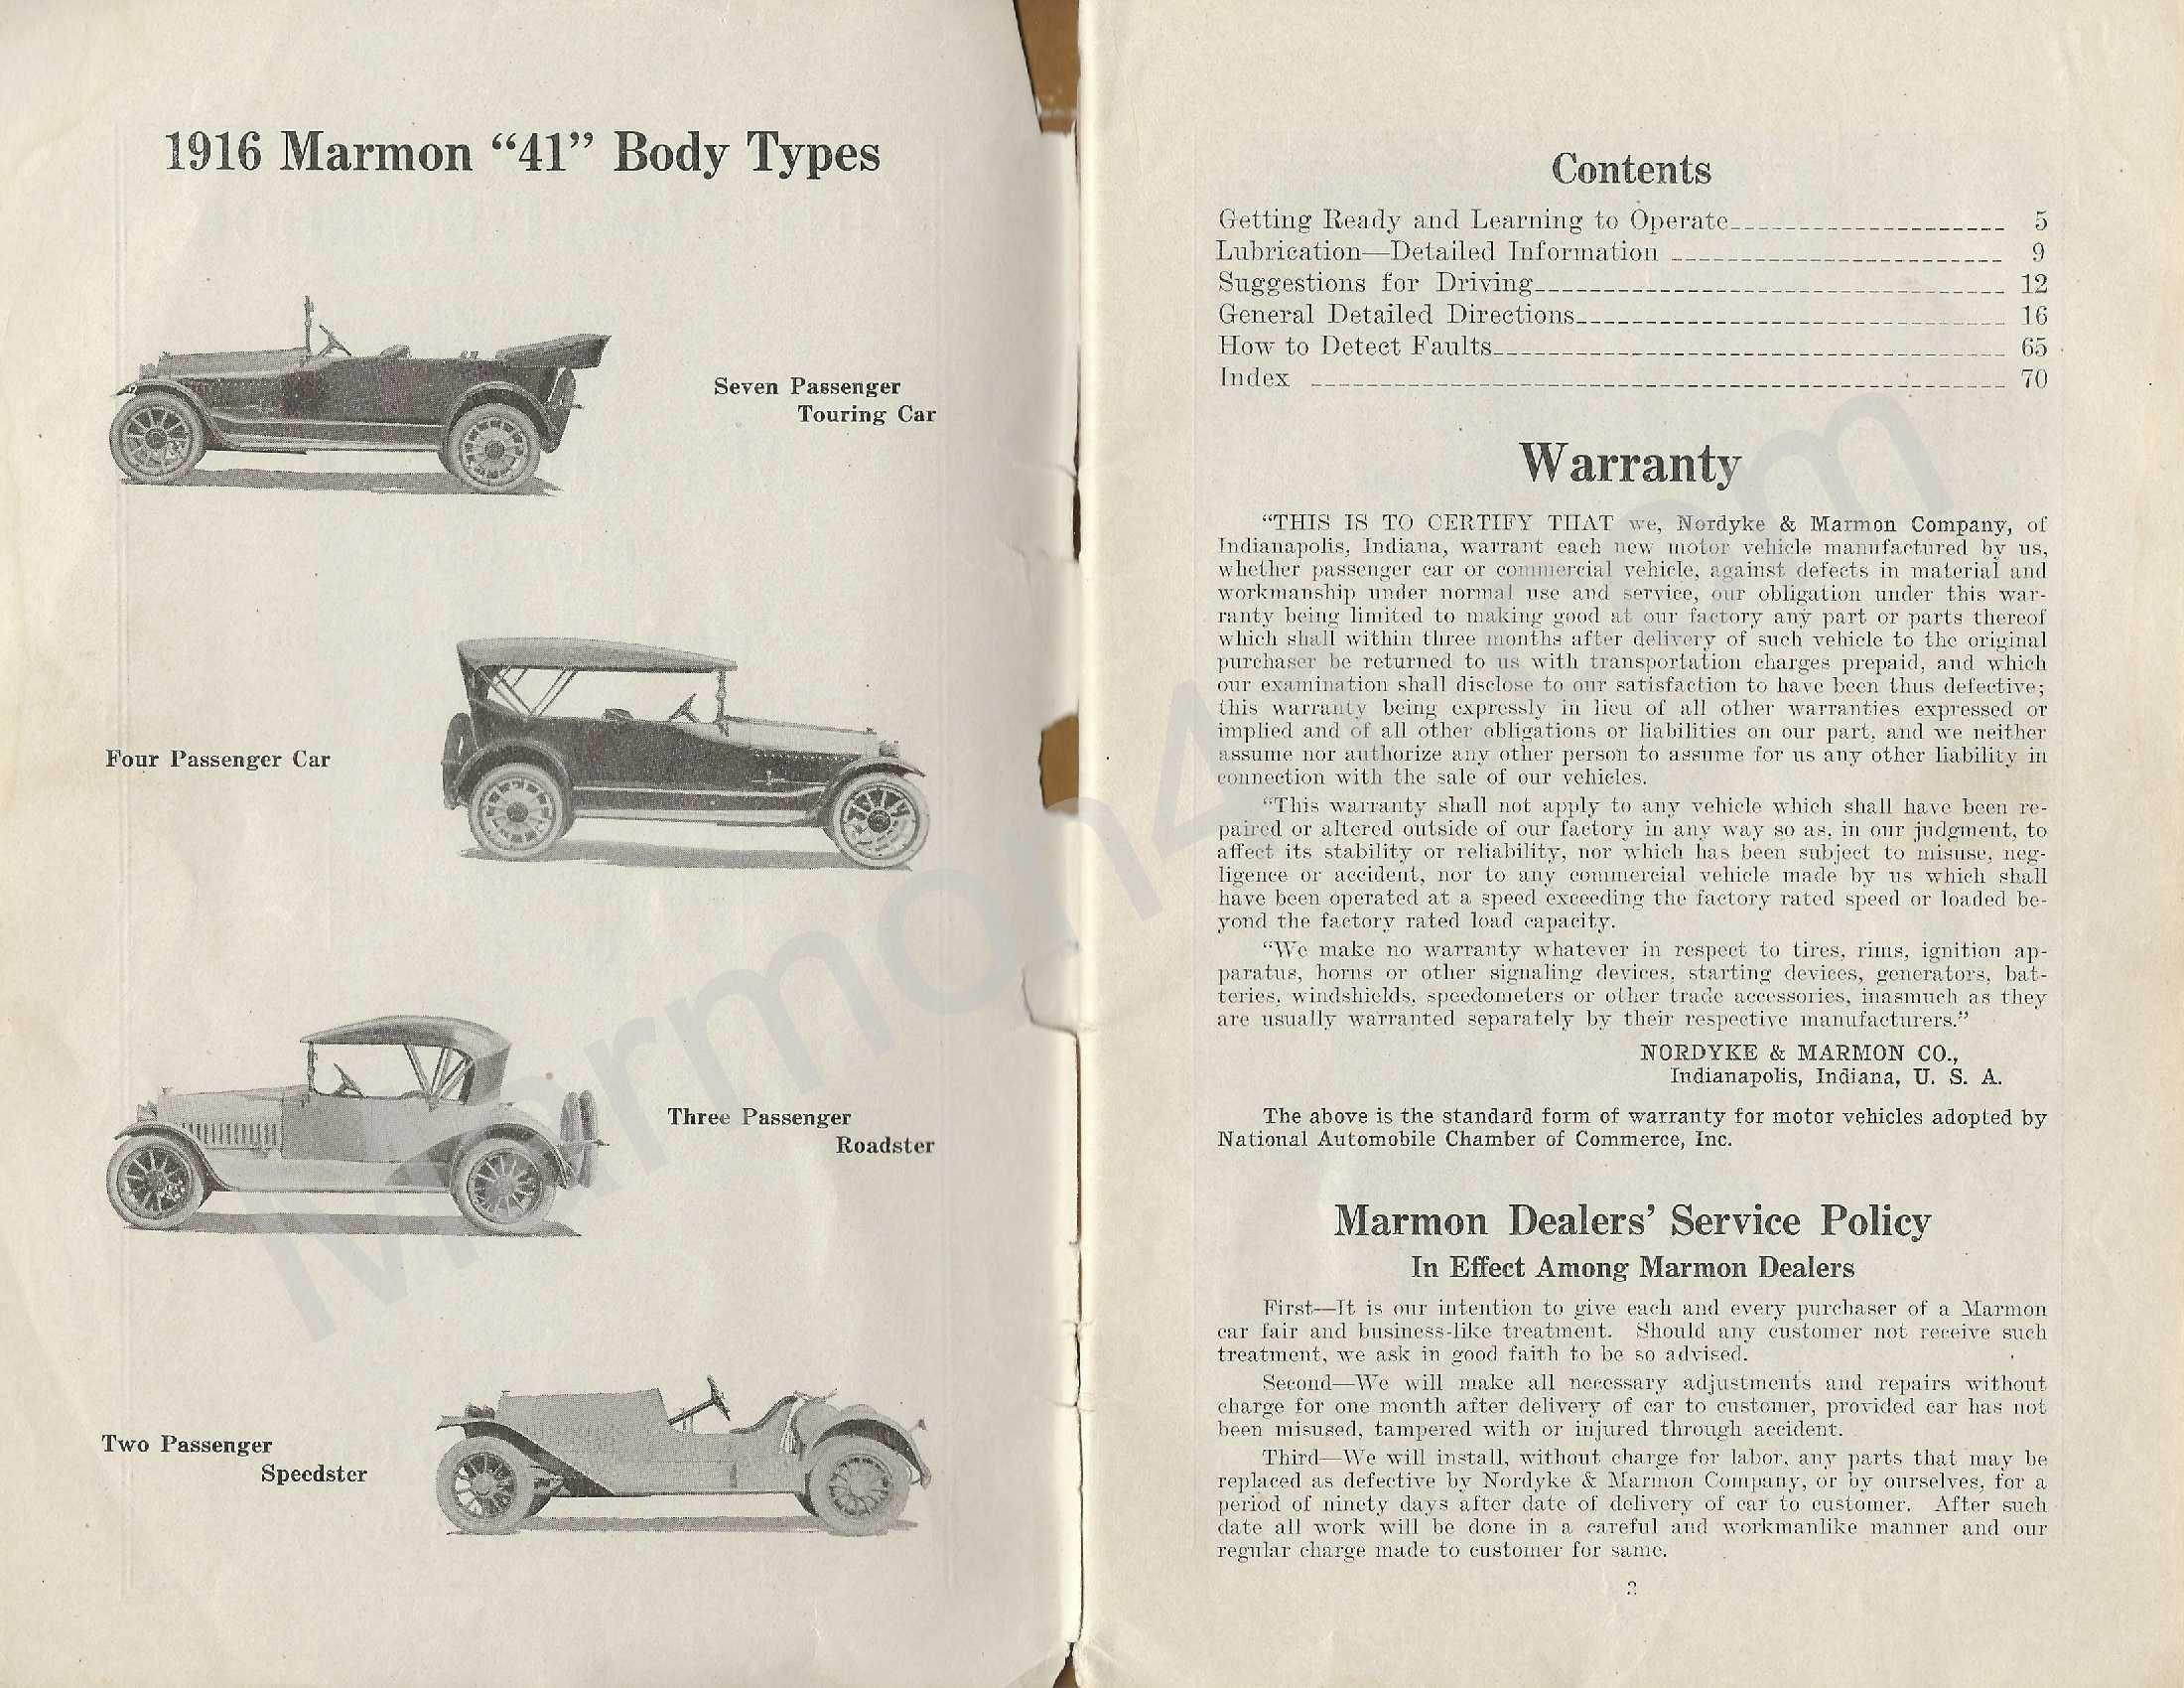 1915-07-01_Marmon41_Info_Book_1534-B_3